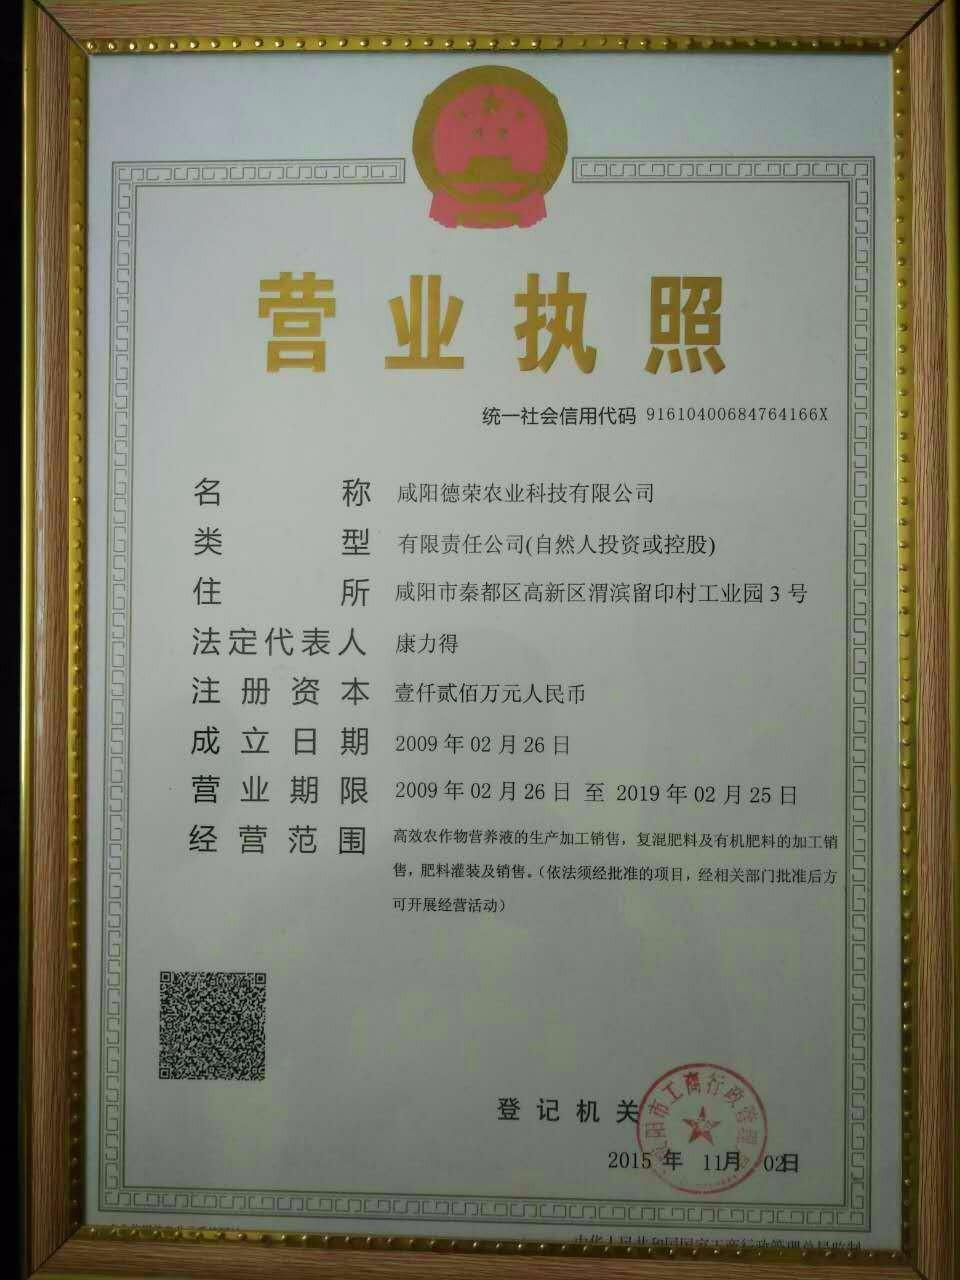 20-20-20—TE大量元素水溶肥 5kg 平衡型